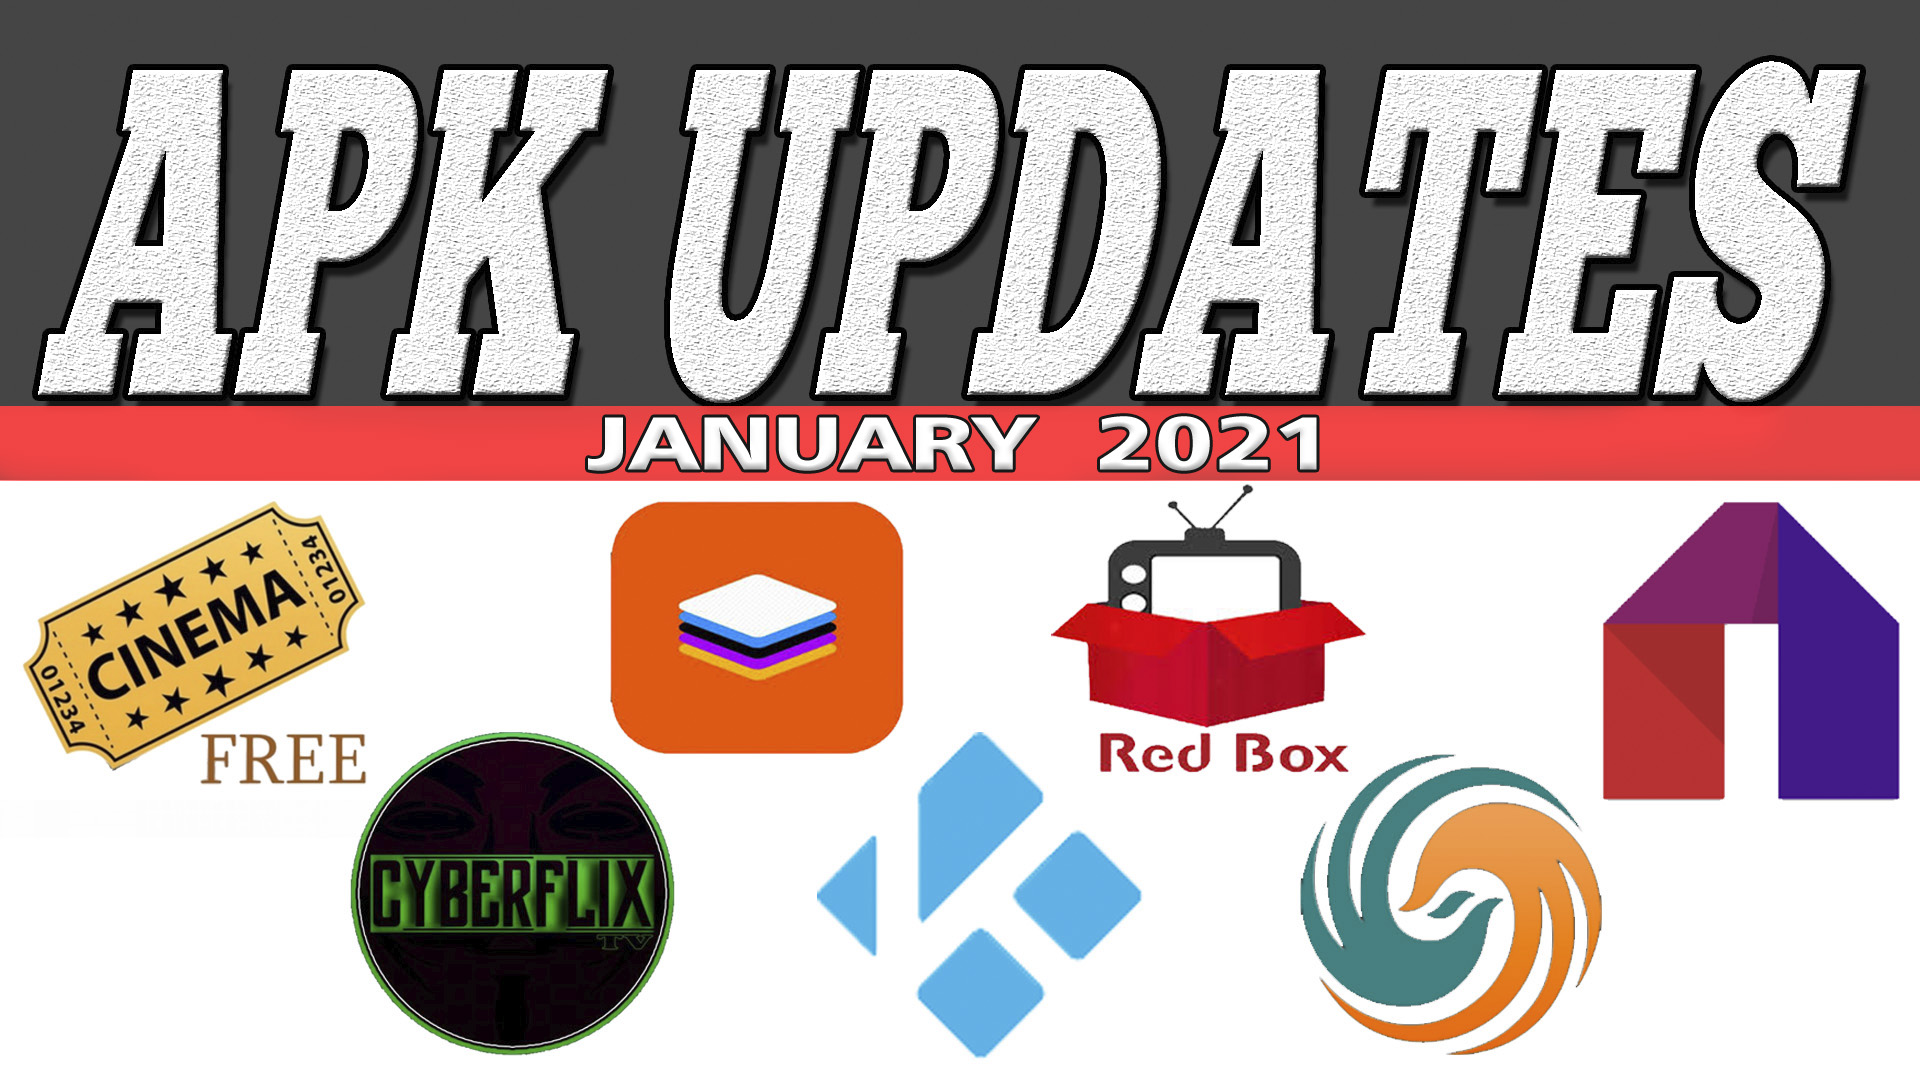 APK UPDATES JANUARY 2021